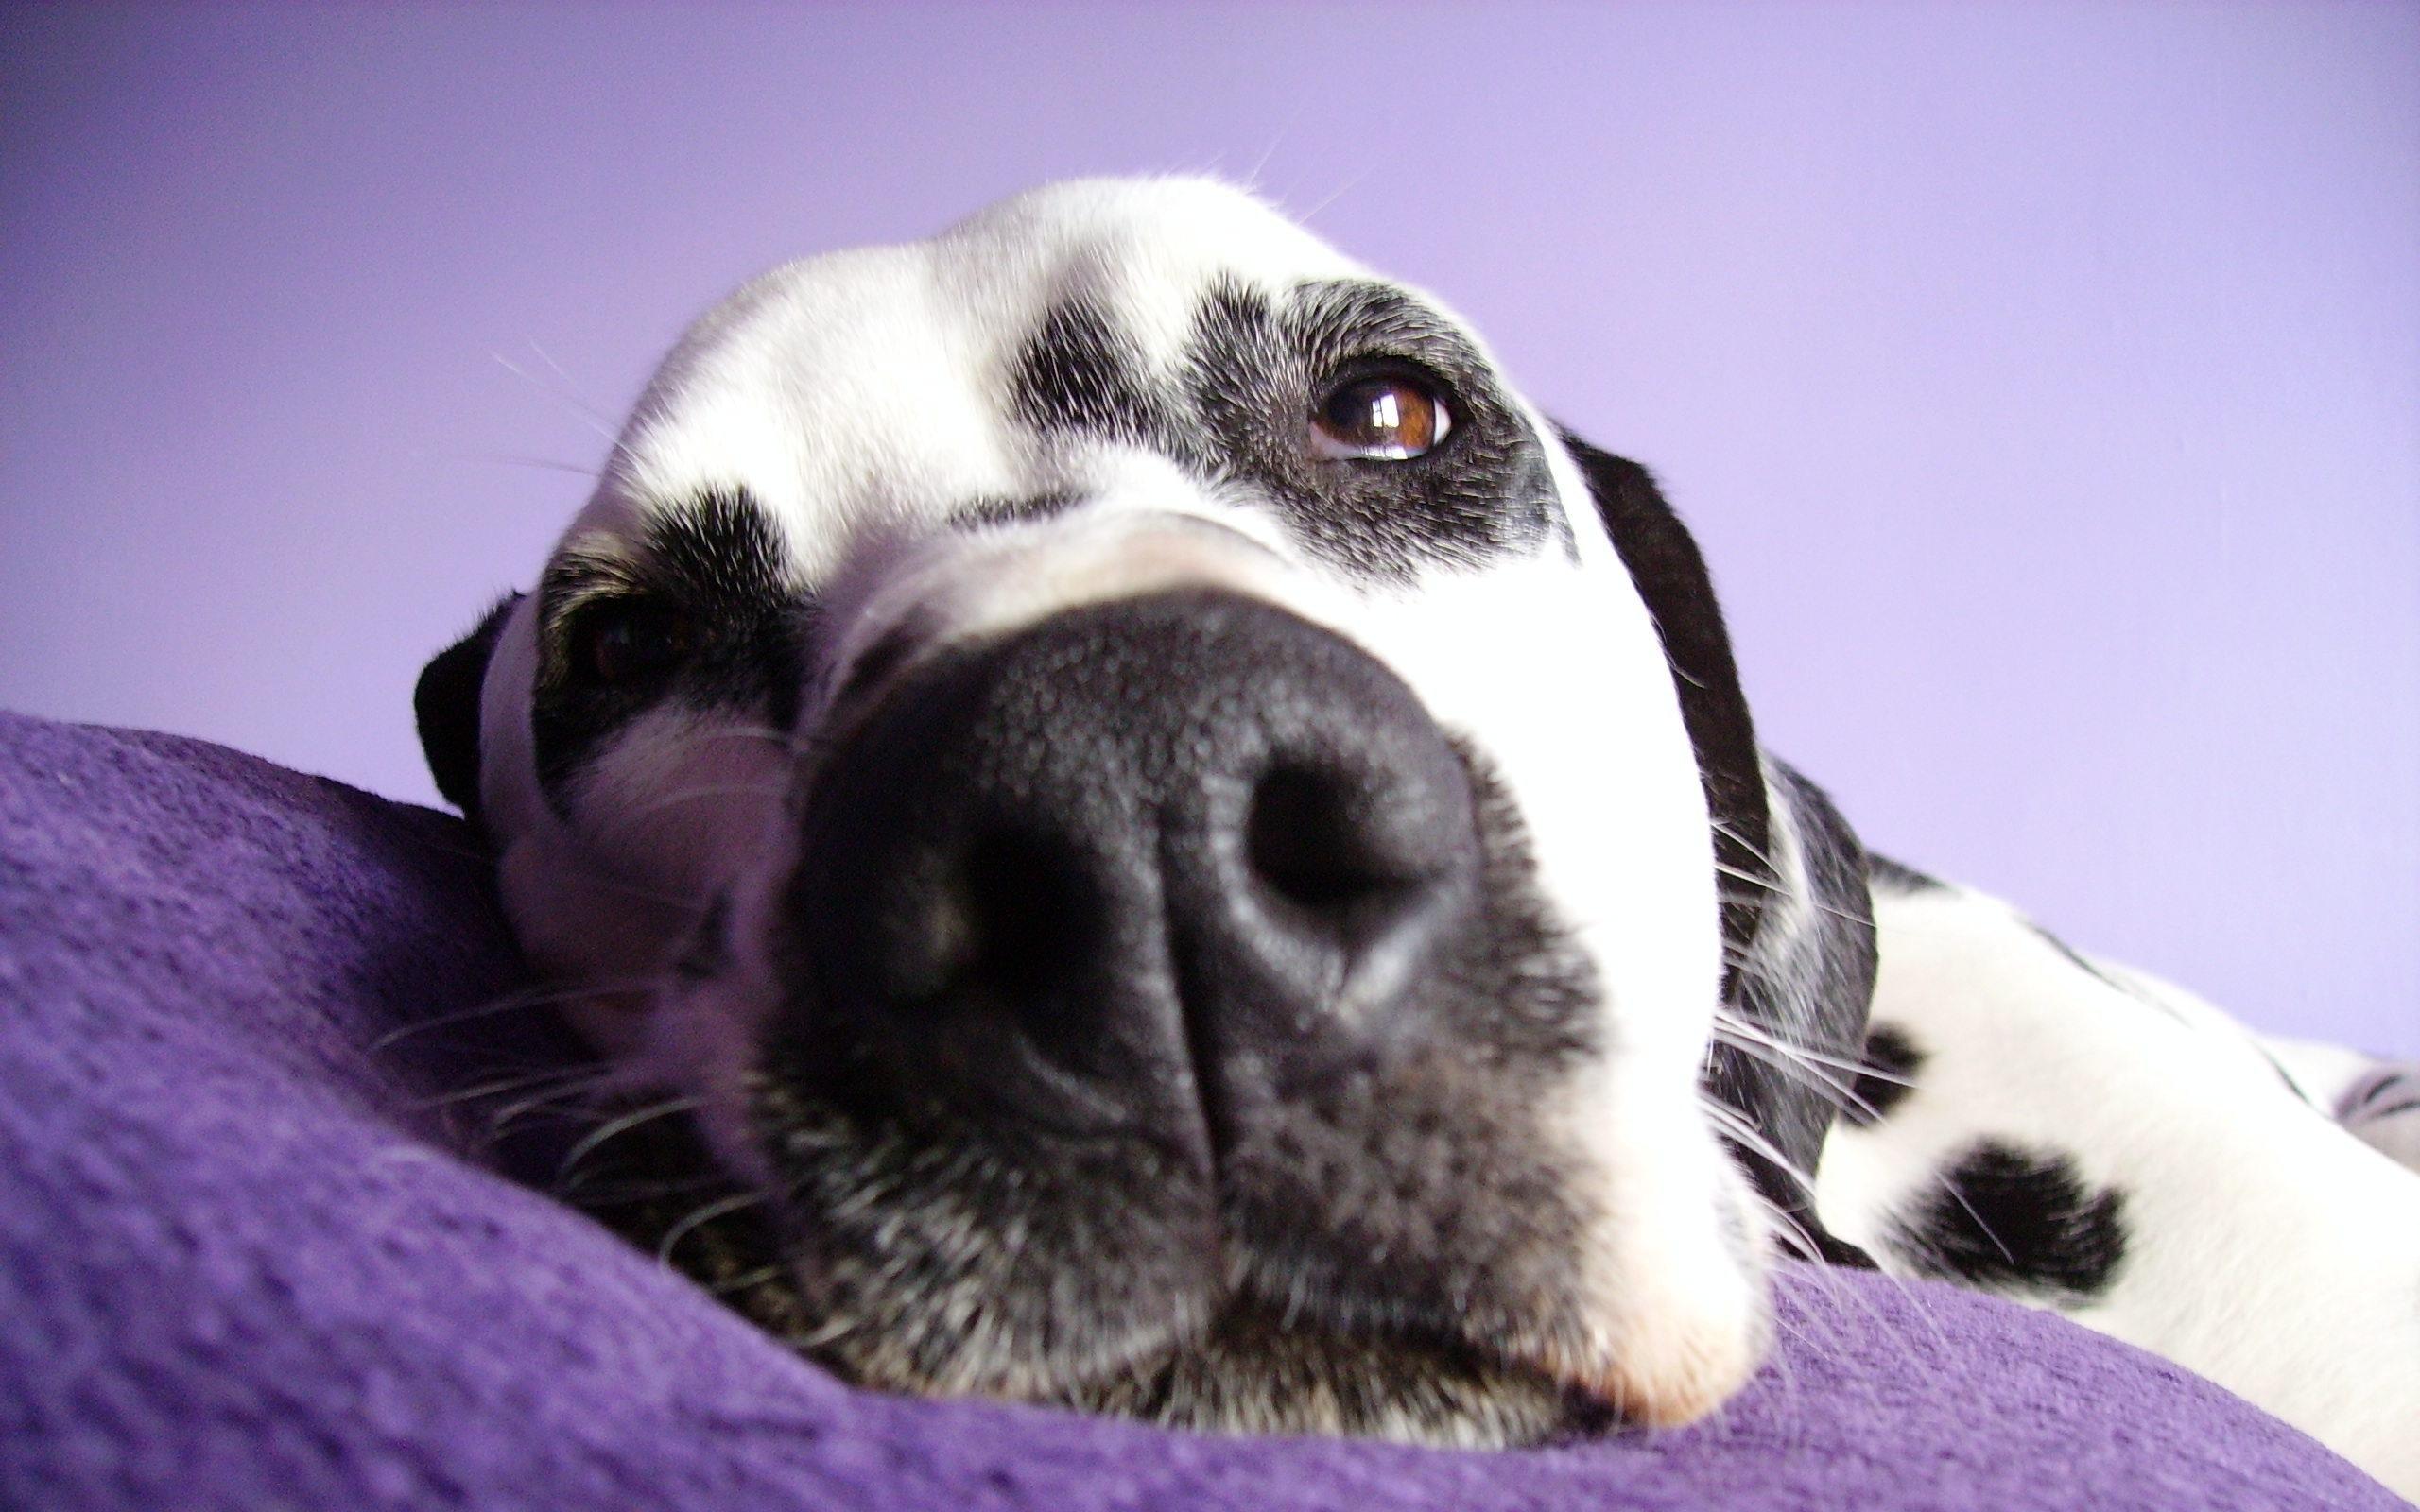 Cute Puppies Full Hd Wallpapers 22 Hd Dalmatian Dog Wallpapers Hdwallsource Com